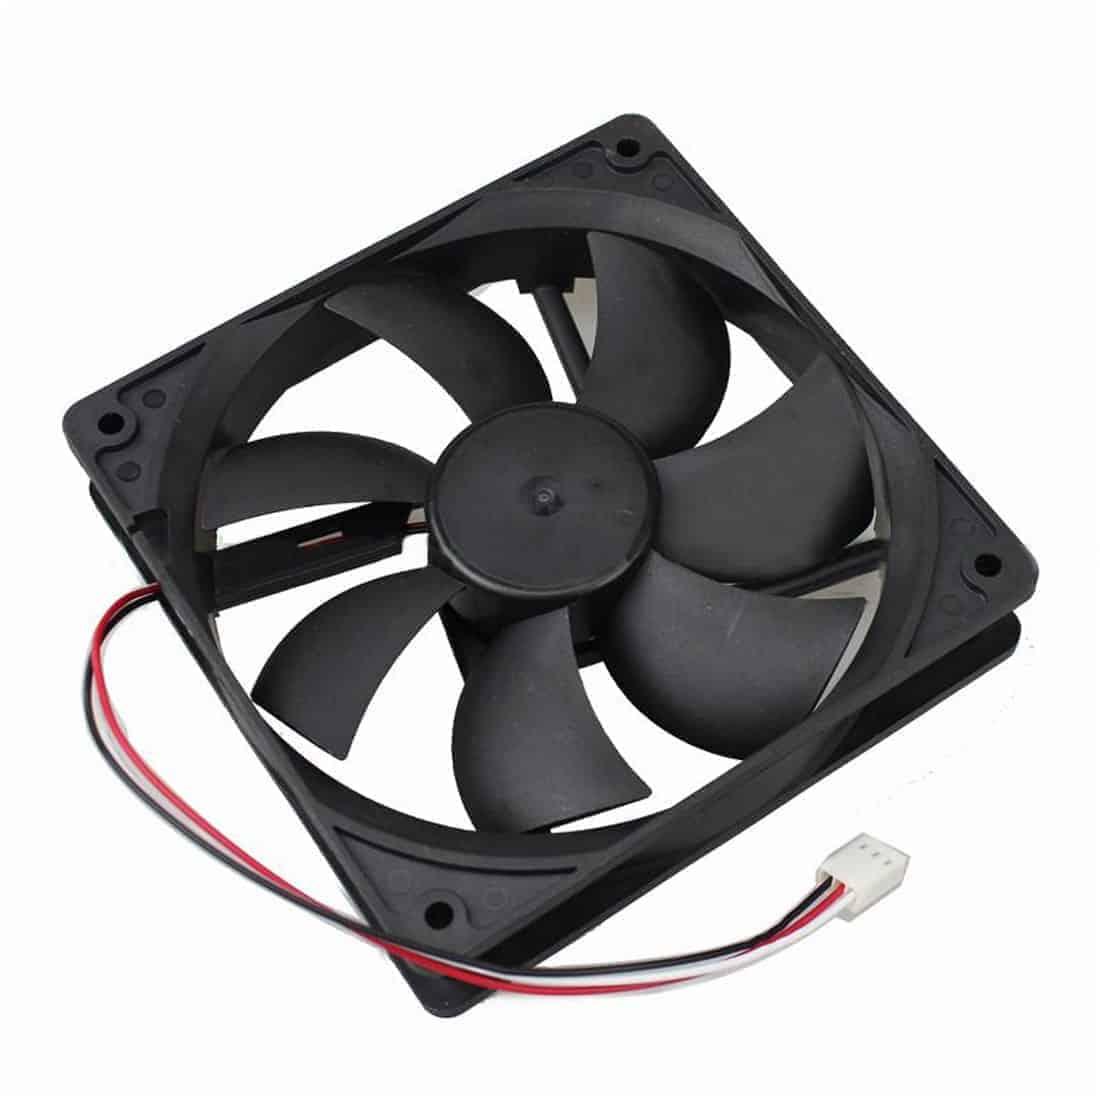 Pc Cooling Fan Wiring Great Design Of Diagram Automotive Electric 12025 Dc 12v 24v 48v 2 3 Pin 1984 Corvette